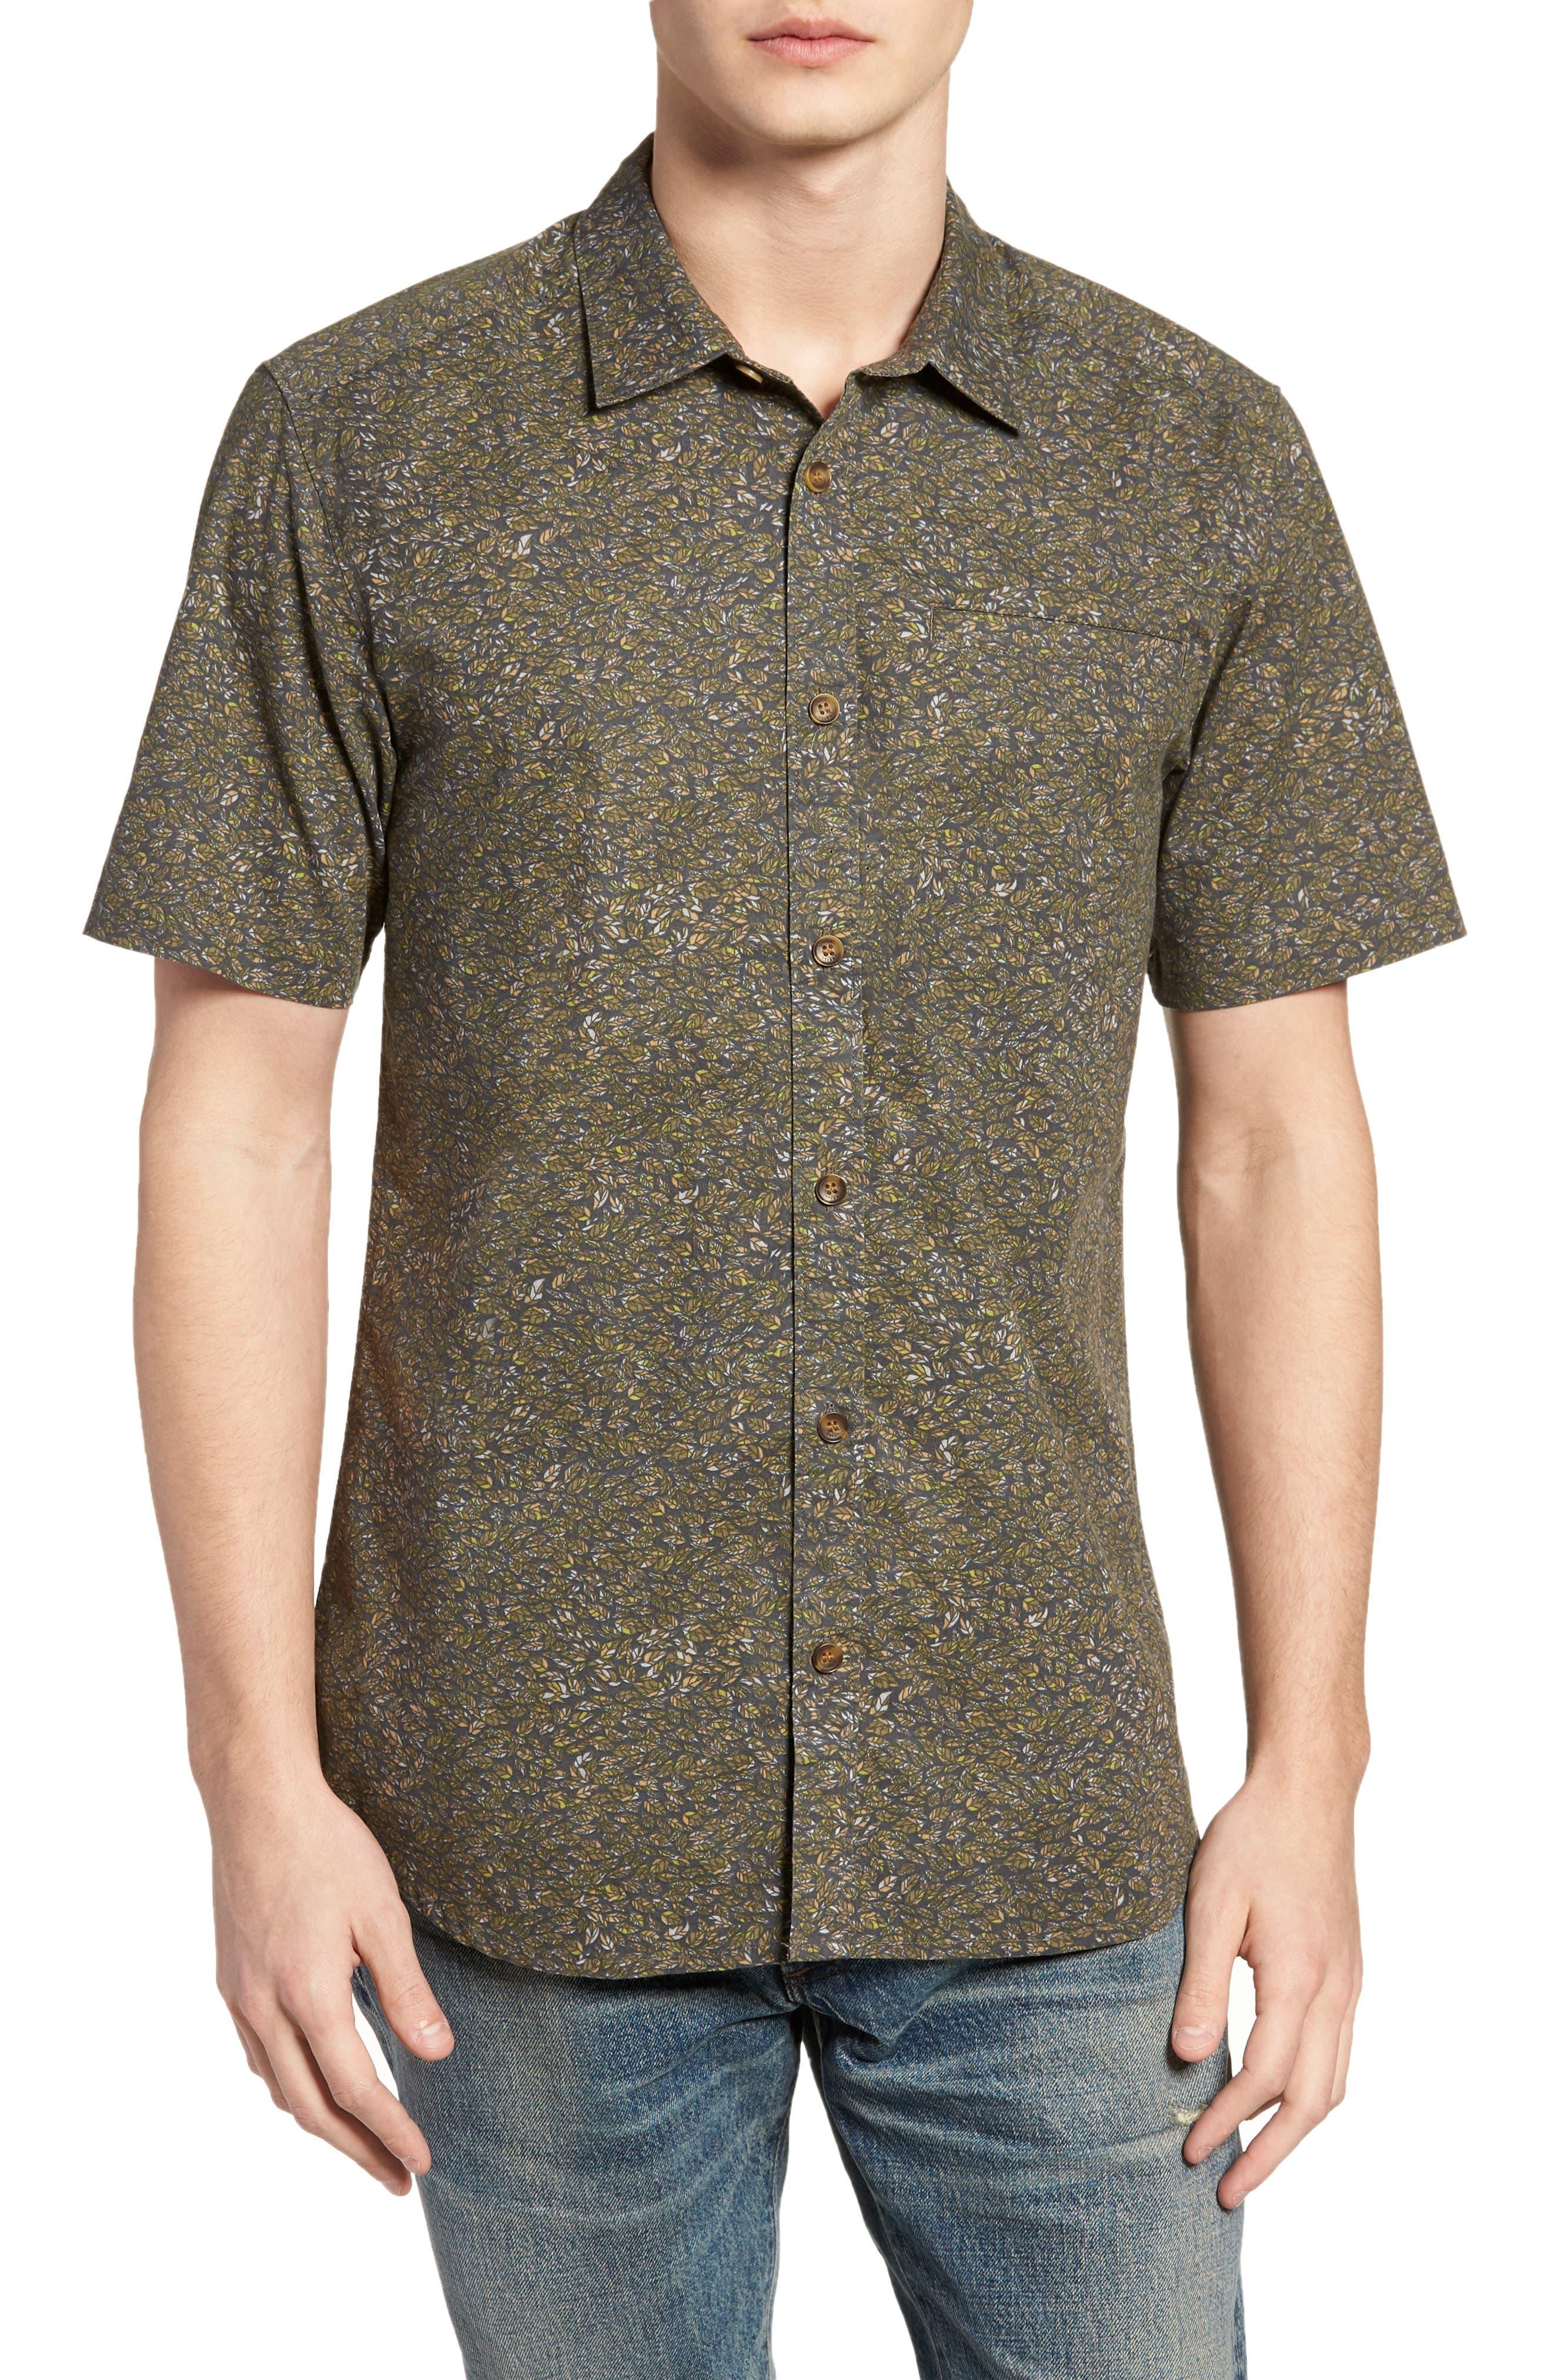 O'Neill Livingston Short Sleeve Shirt